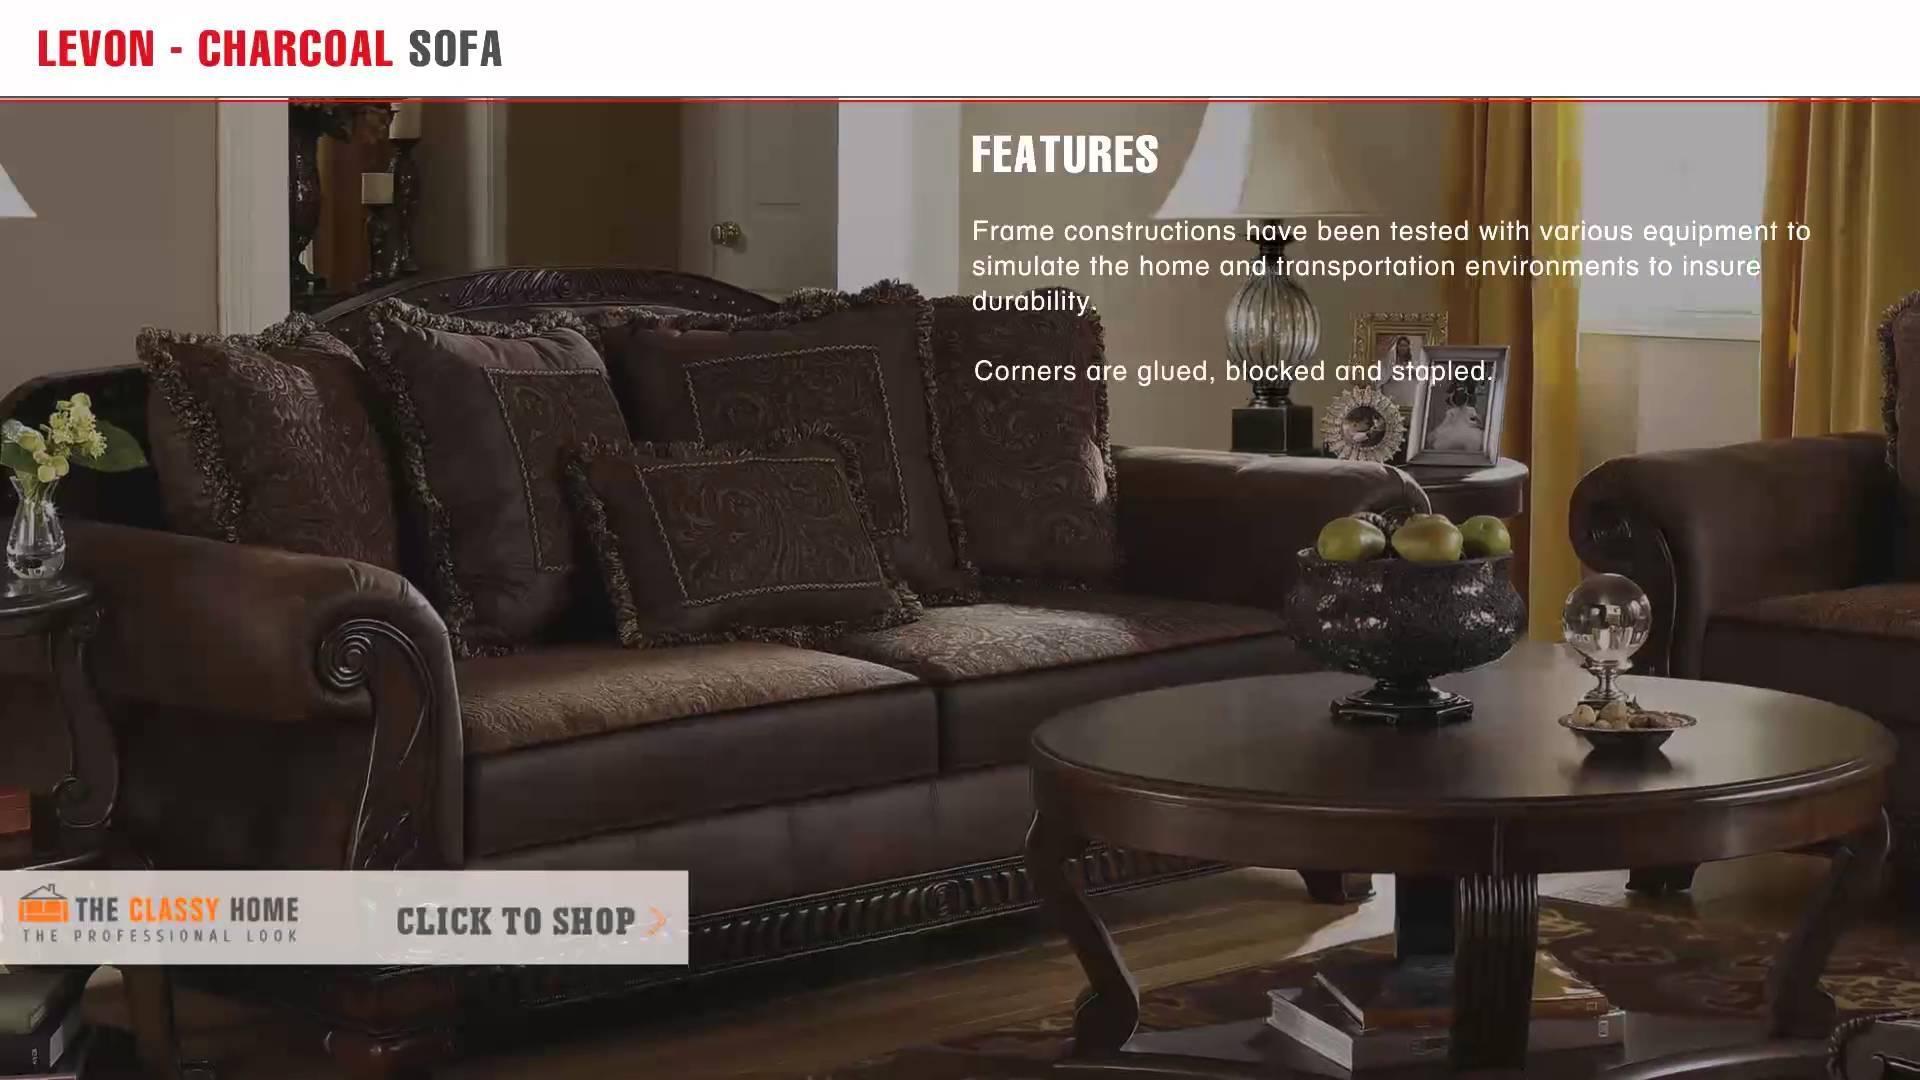 Ashley Furniture Bradington Traditional Truffle Fabric Sofa – Youtube With Regard To Bradington Truffle Sofas (Image 3 of 20)